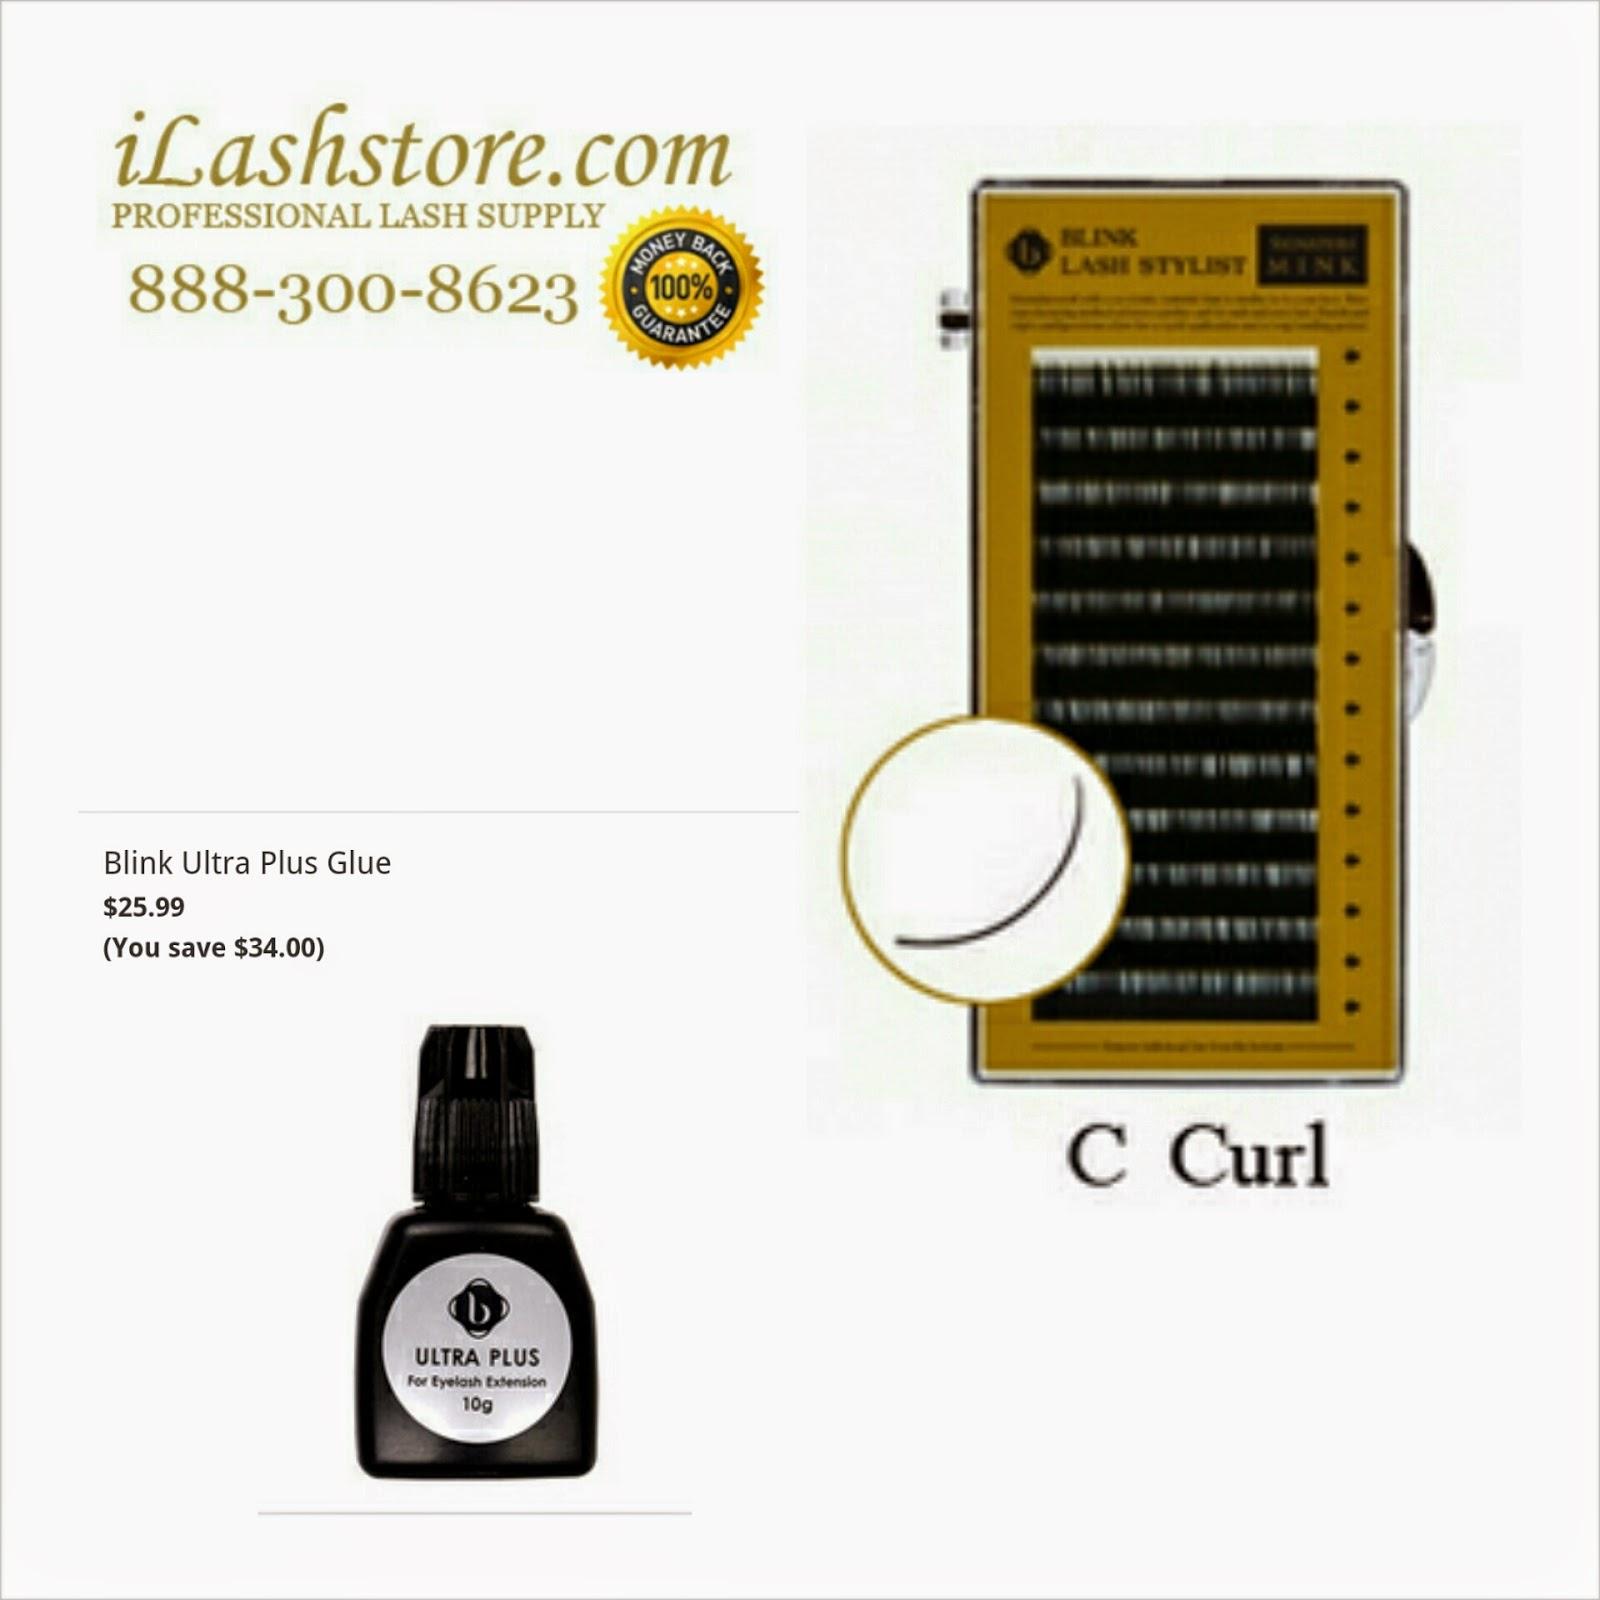 Livid Lash Fall Product Review Sugar Lash Pro Blink Mink